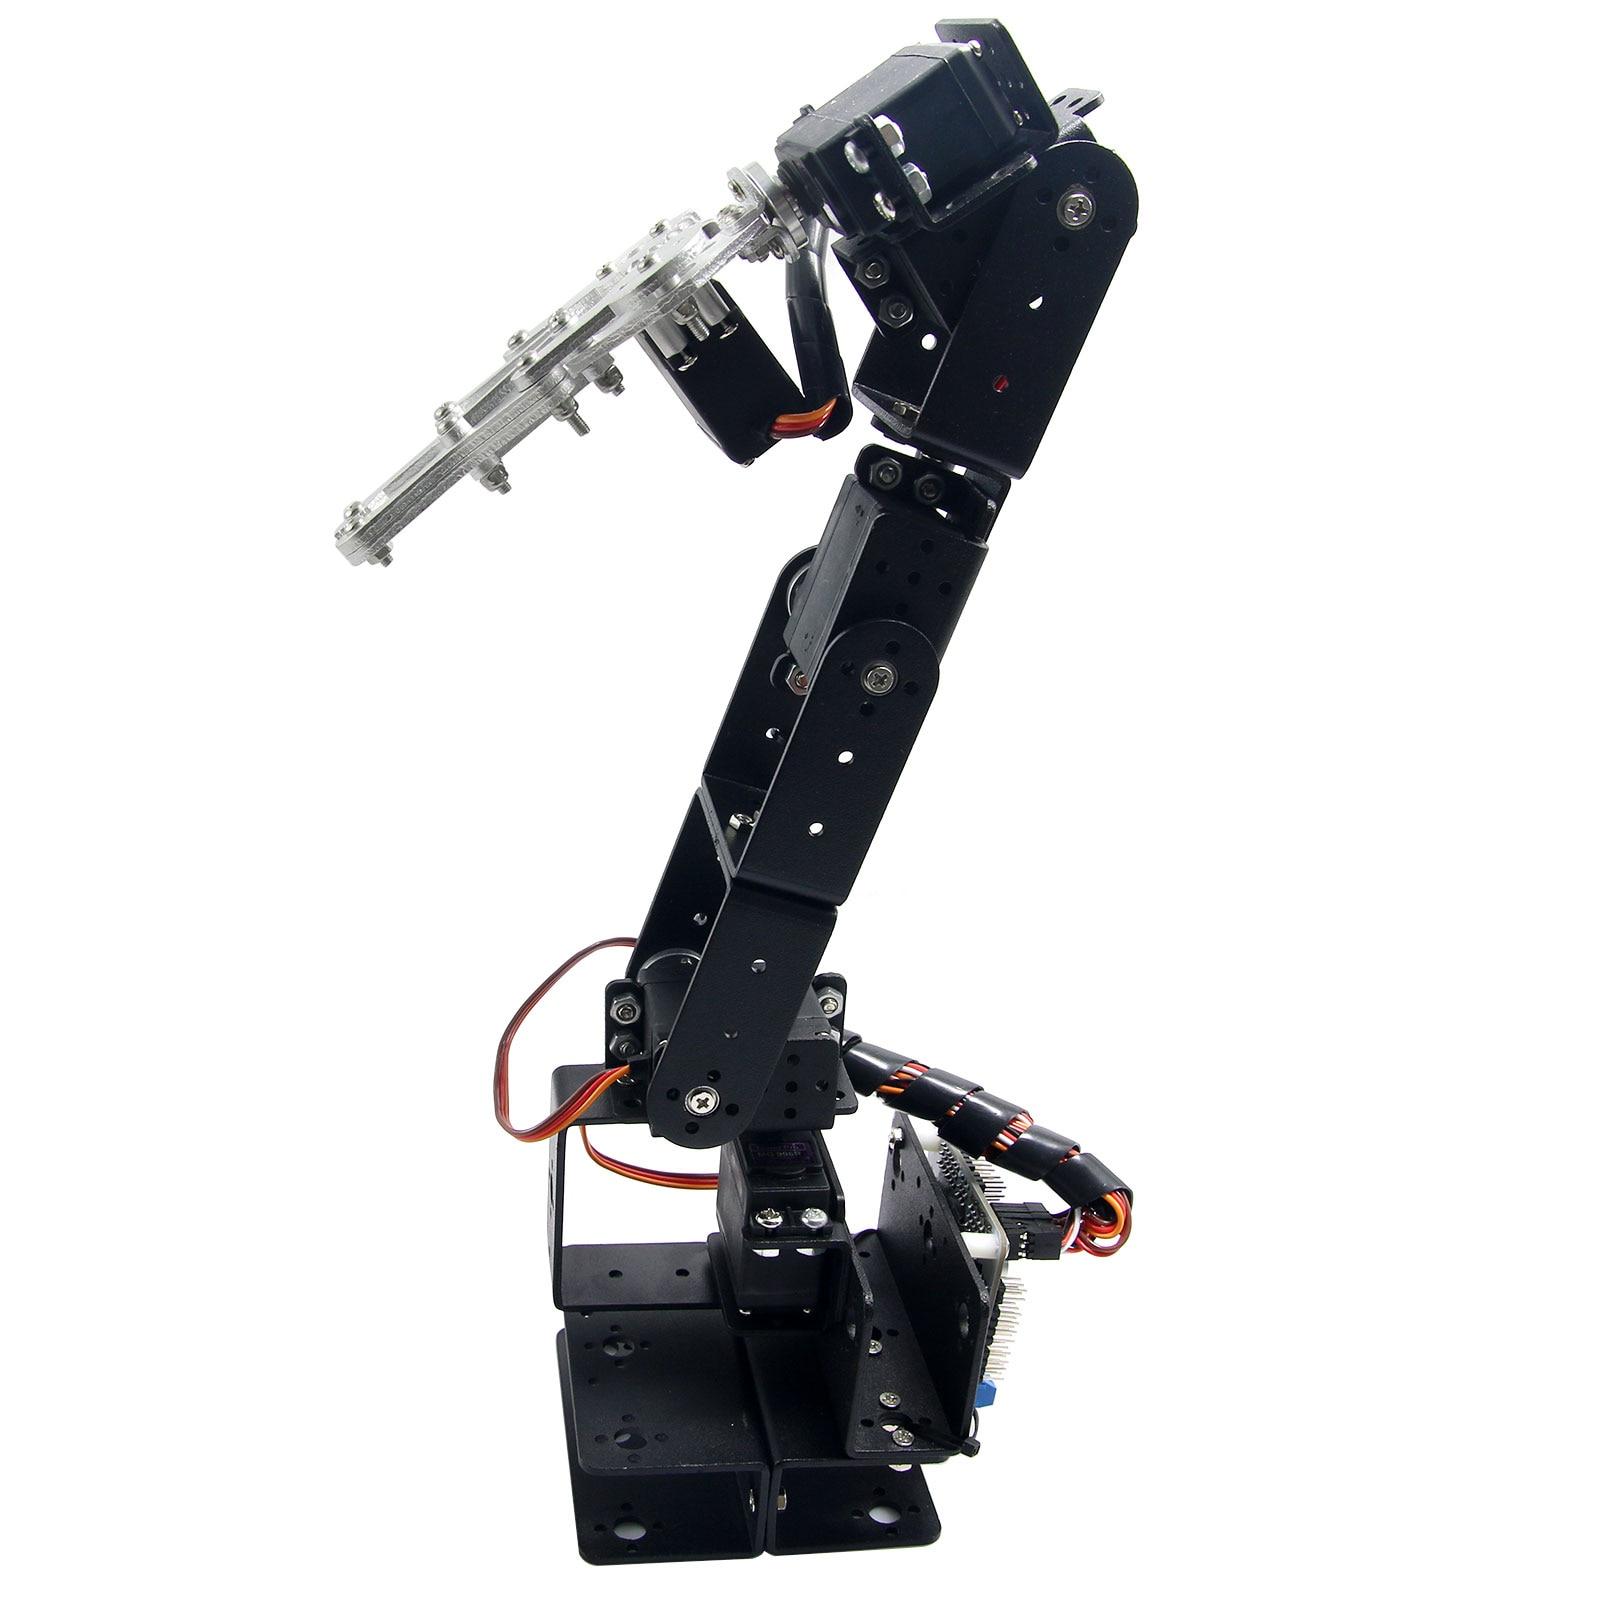 Robot 6 DOF Aluminium Mechanical Robotic Arm Clamp Claw Mount kit & 6pcs Servos & Metal Servo Horn for Arduino